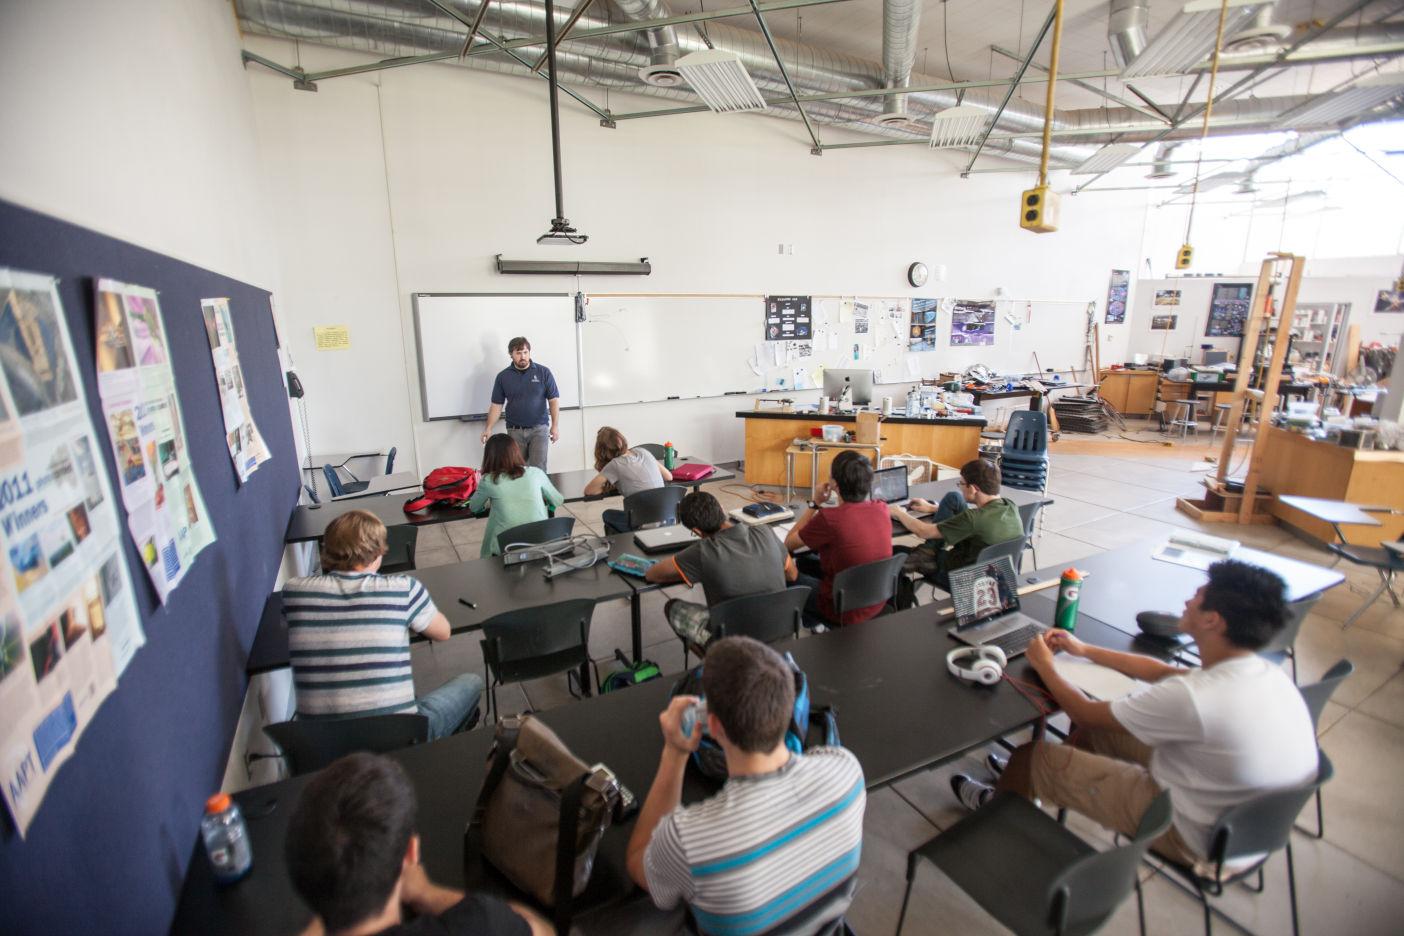 New Name, New Grade Level For The Gregory School   Foothills News    Tucsonlocalmedia.com